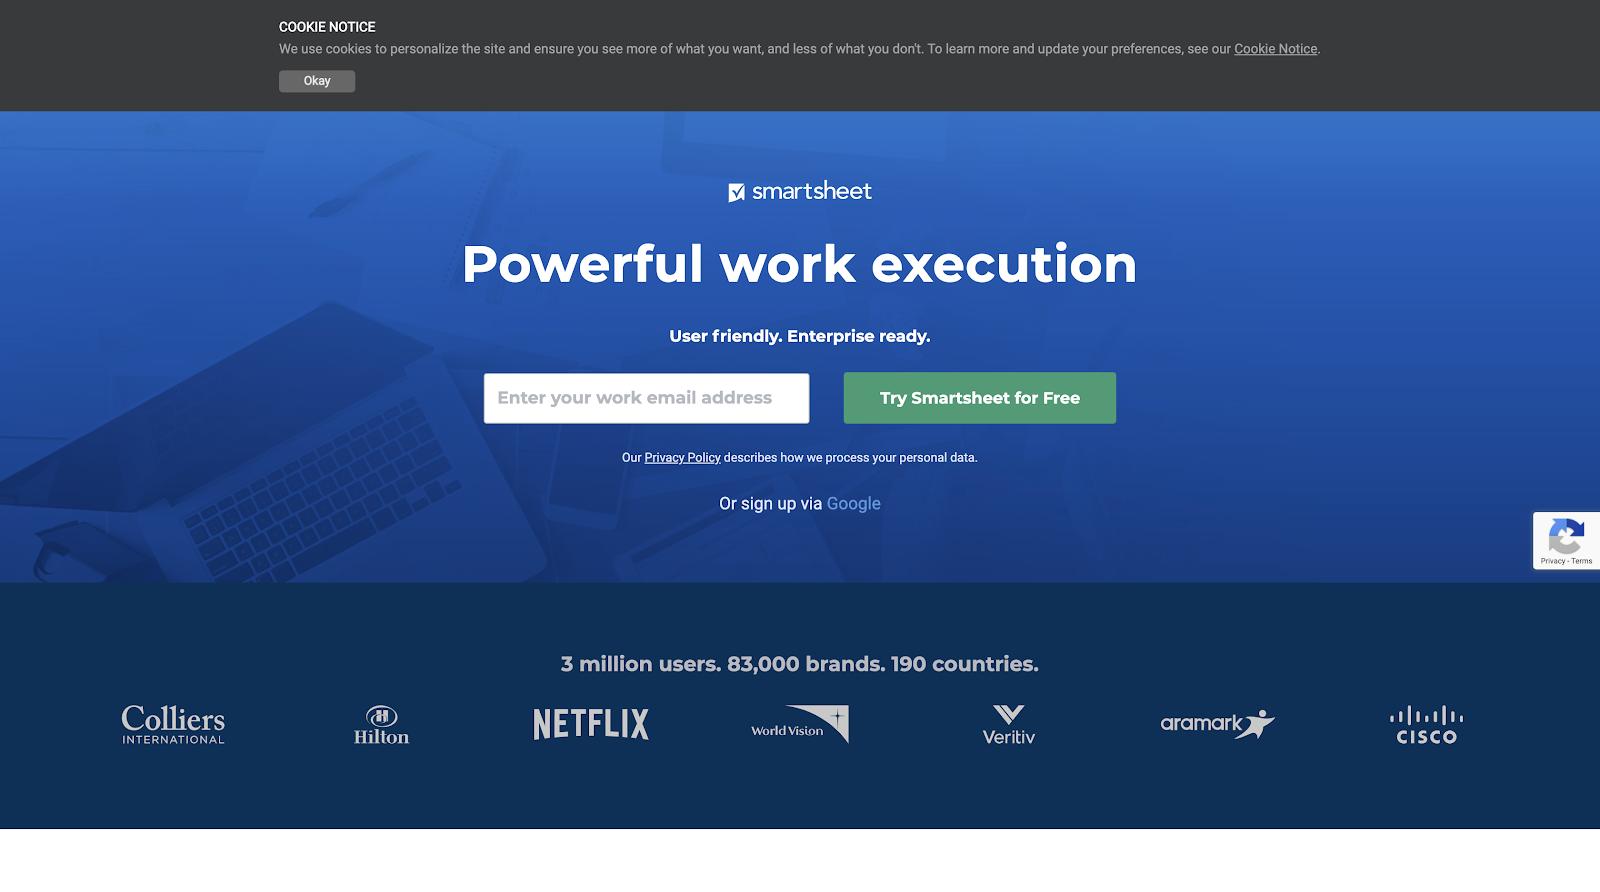 Smartsheet - Powerful work execution